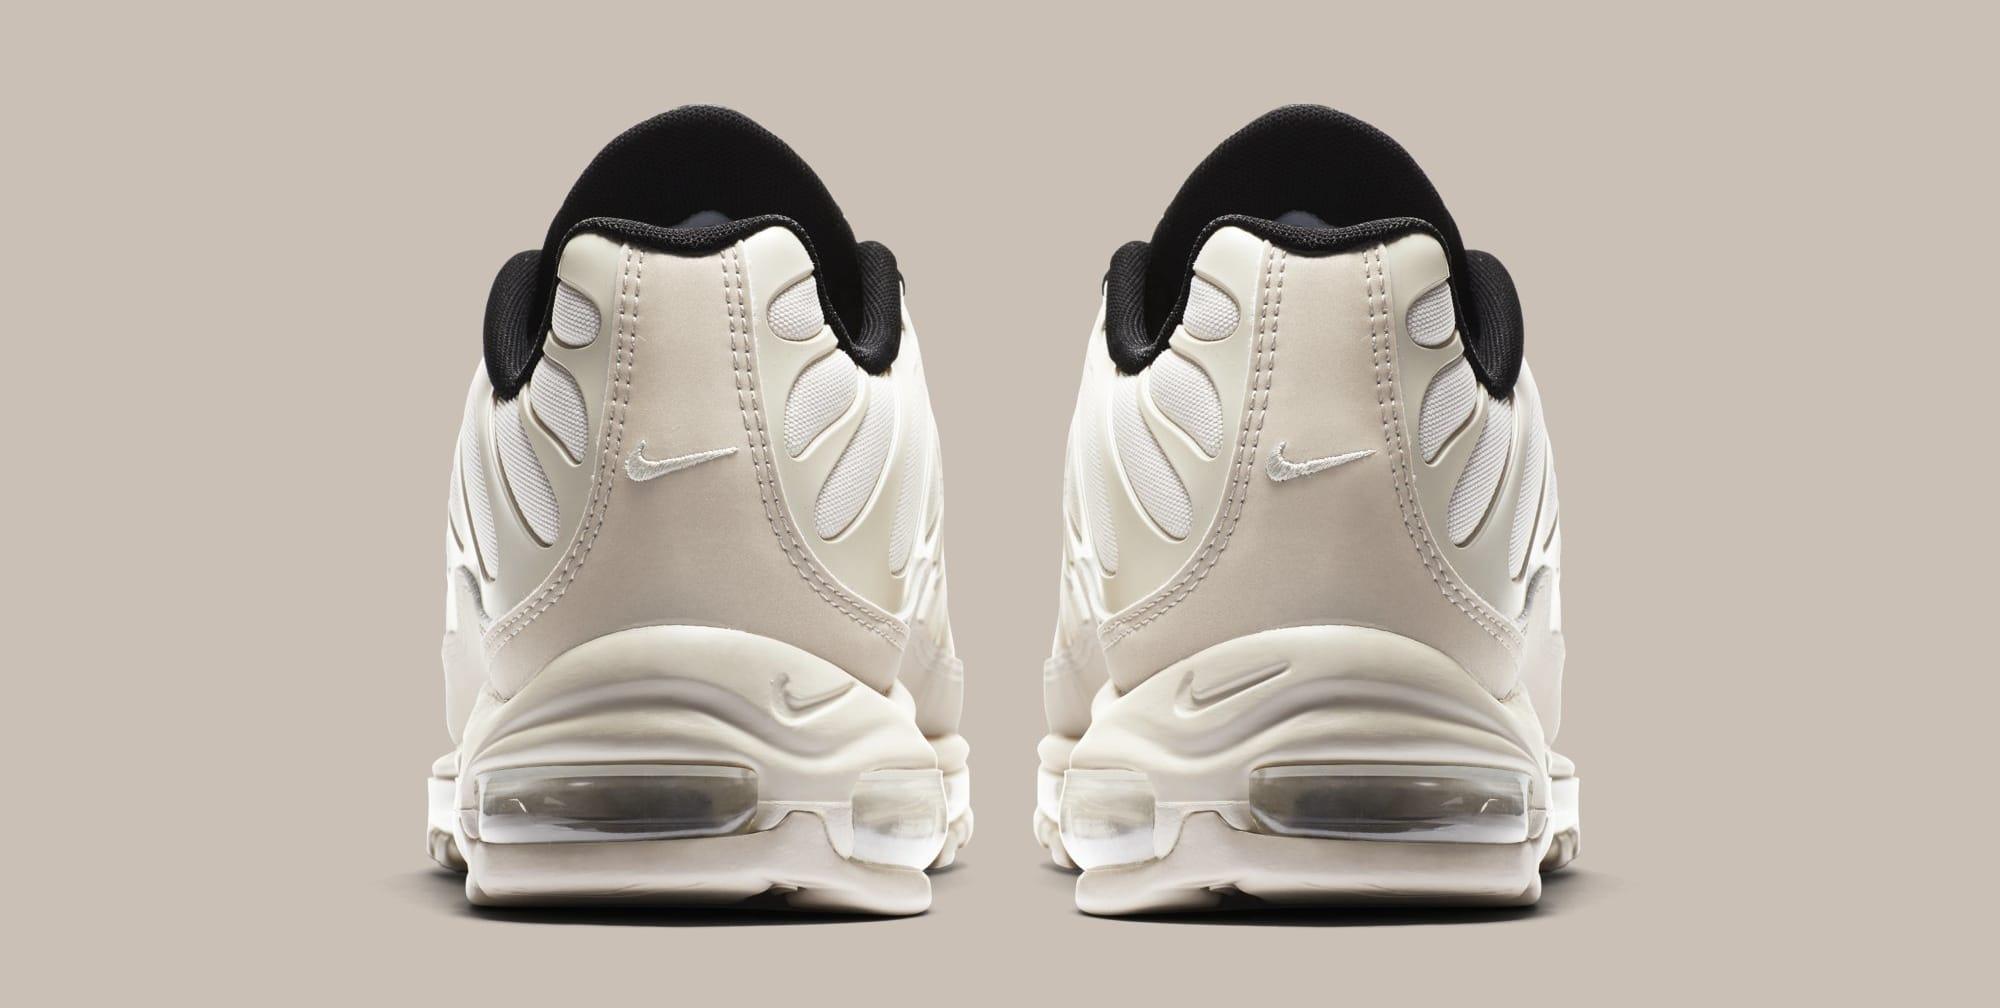 762d70c14ea Image via Nike Nike Air Max 97 Plus  Light Orewood Brown  AH8144-101 (Heel